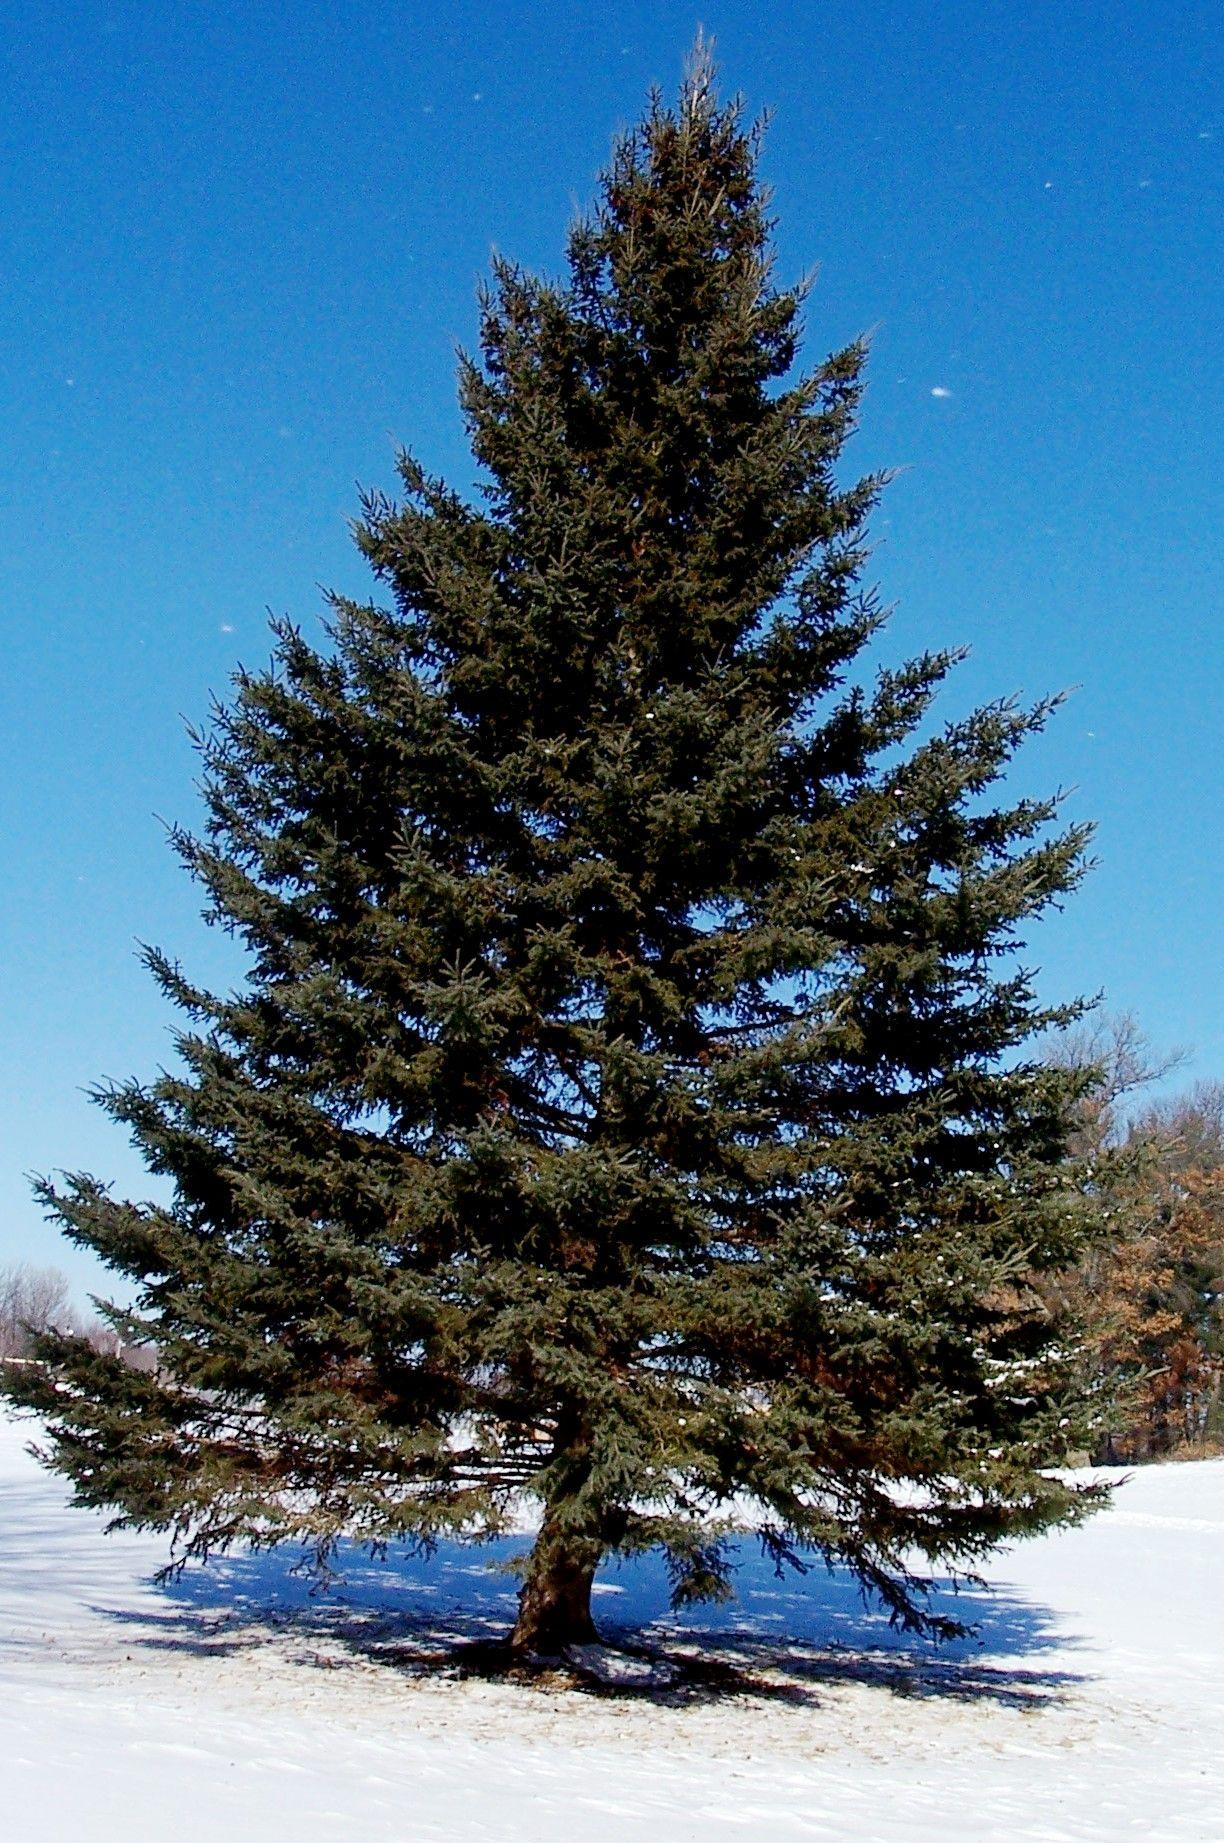 pine tree - Google Search | Trees | Pinterest | Pine tree